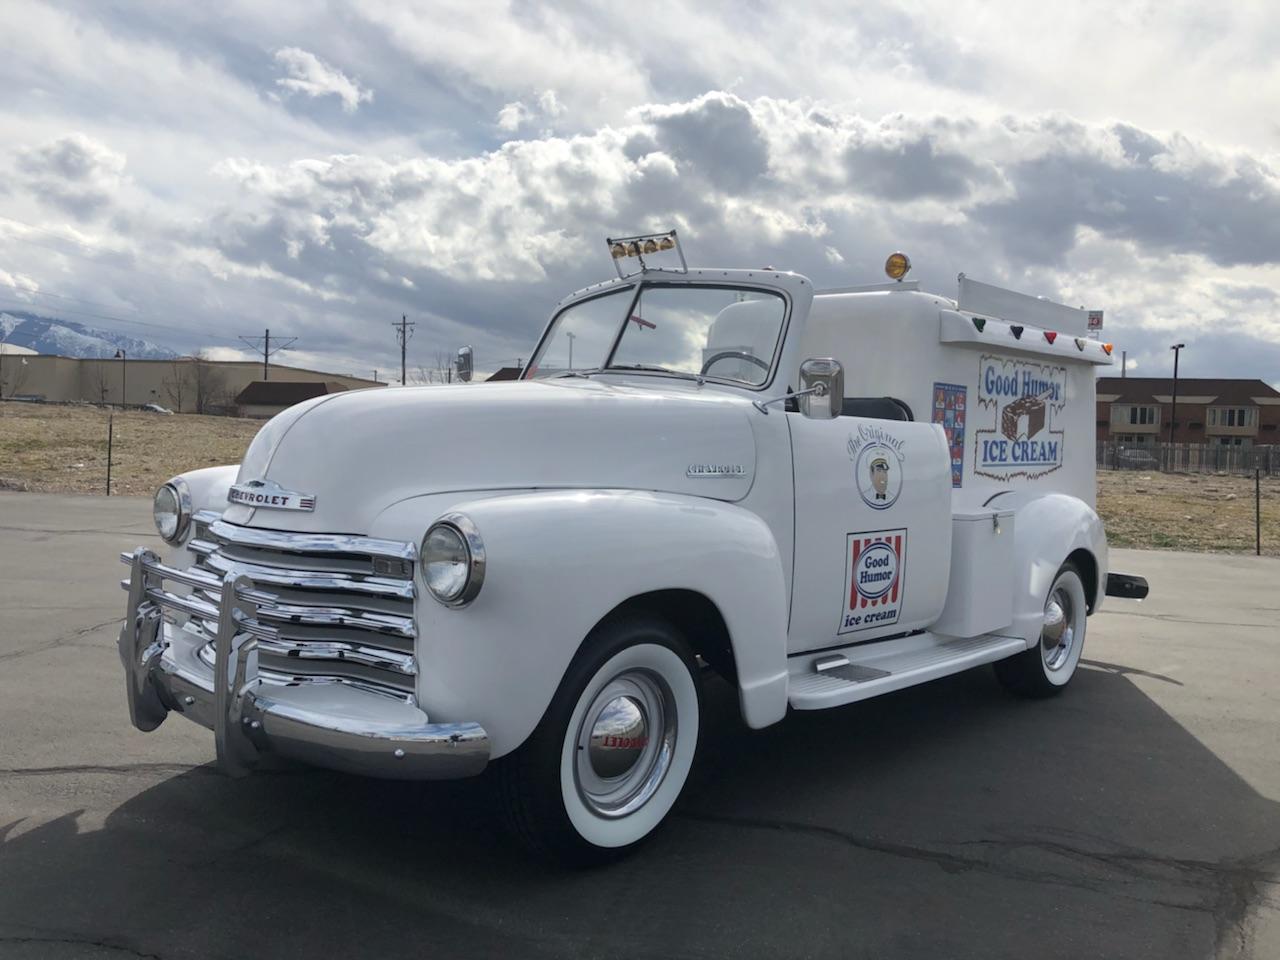 Trucks for Sale   Good Humor Ice Cream Truck